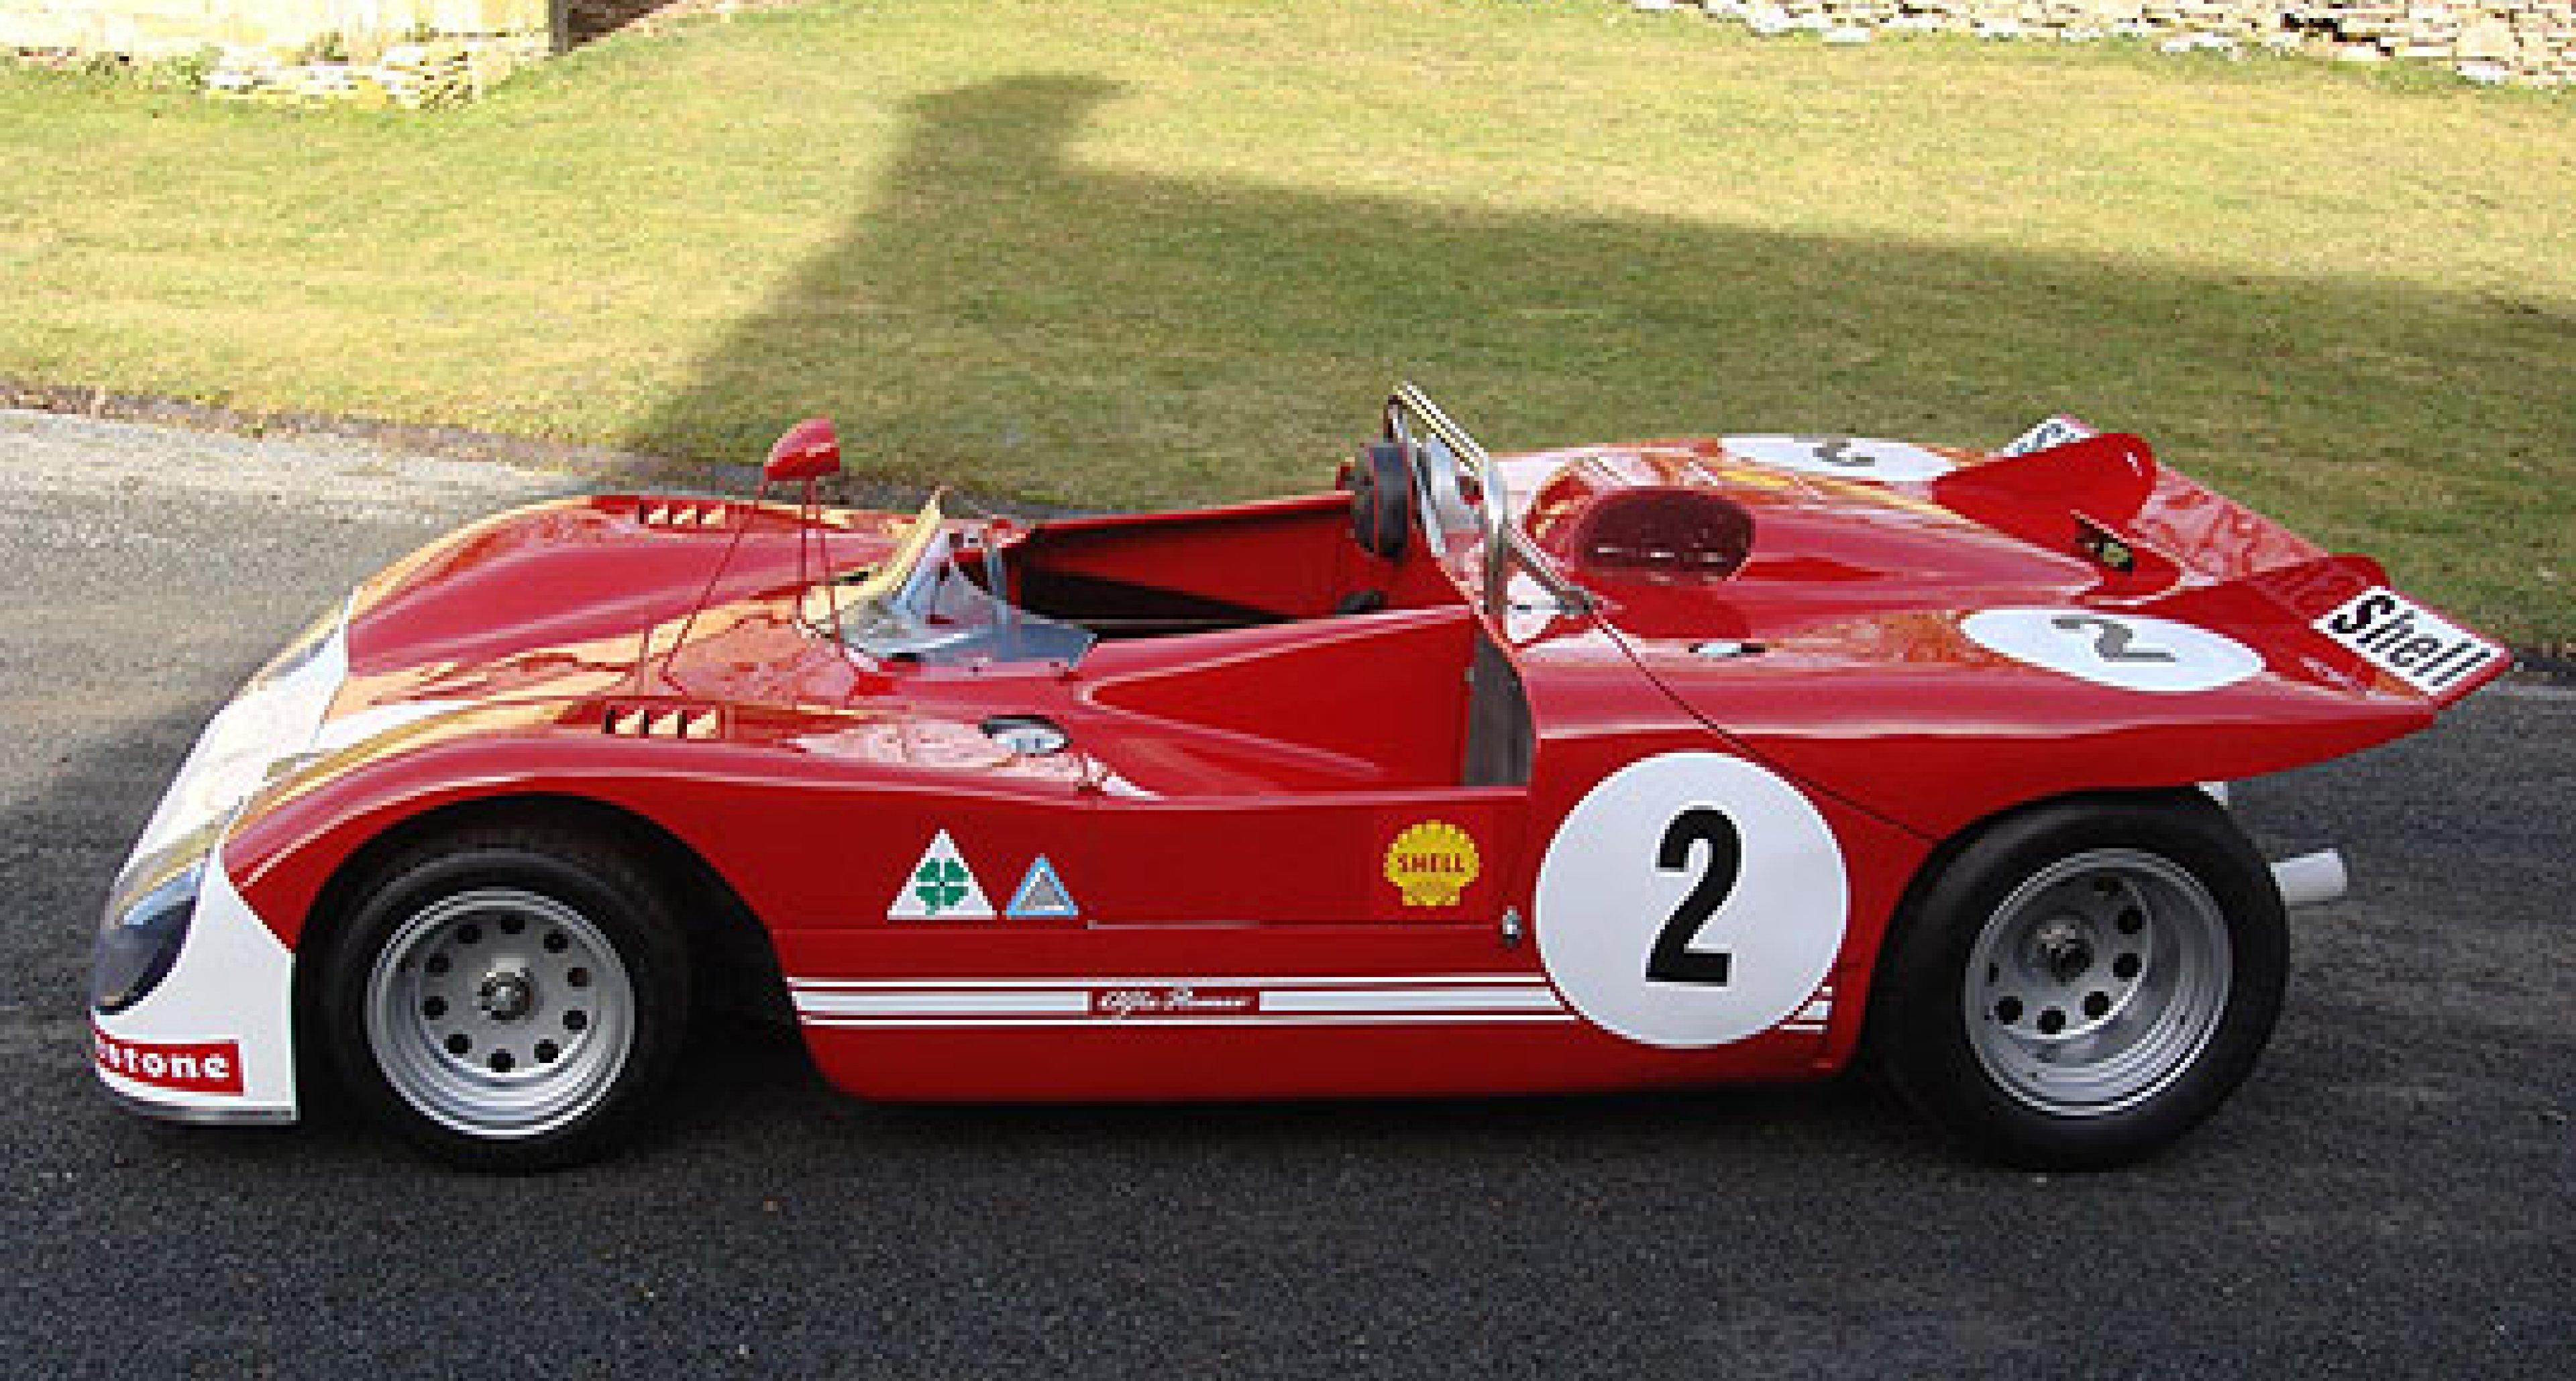 1971 Alfa Romeo Tipo 33/3:  ex-Targa Florio Car Comes to Market